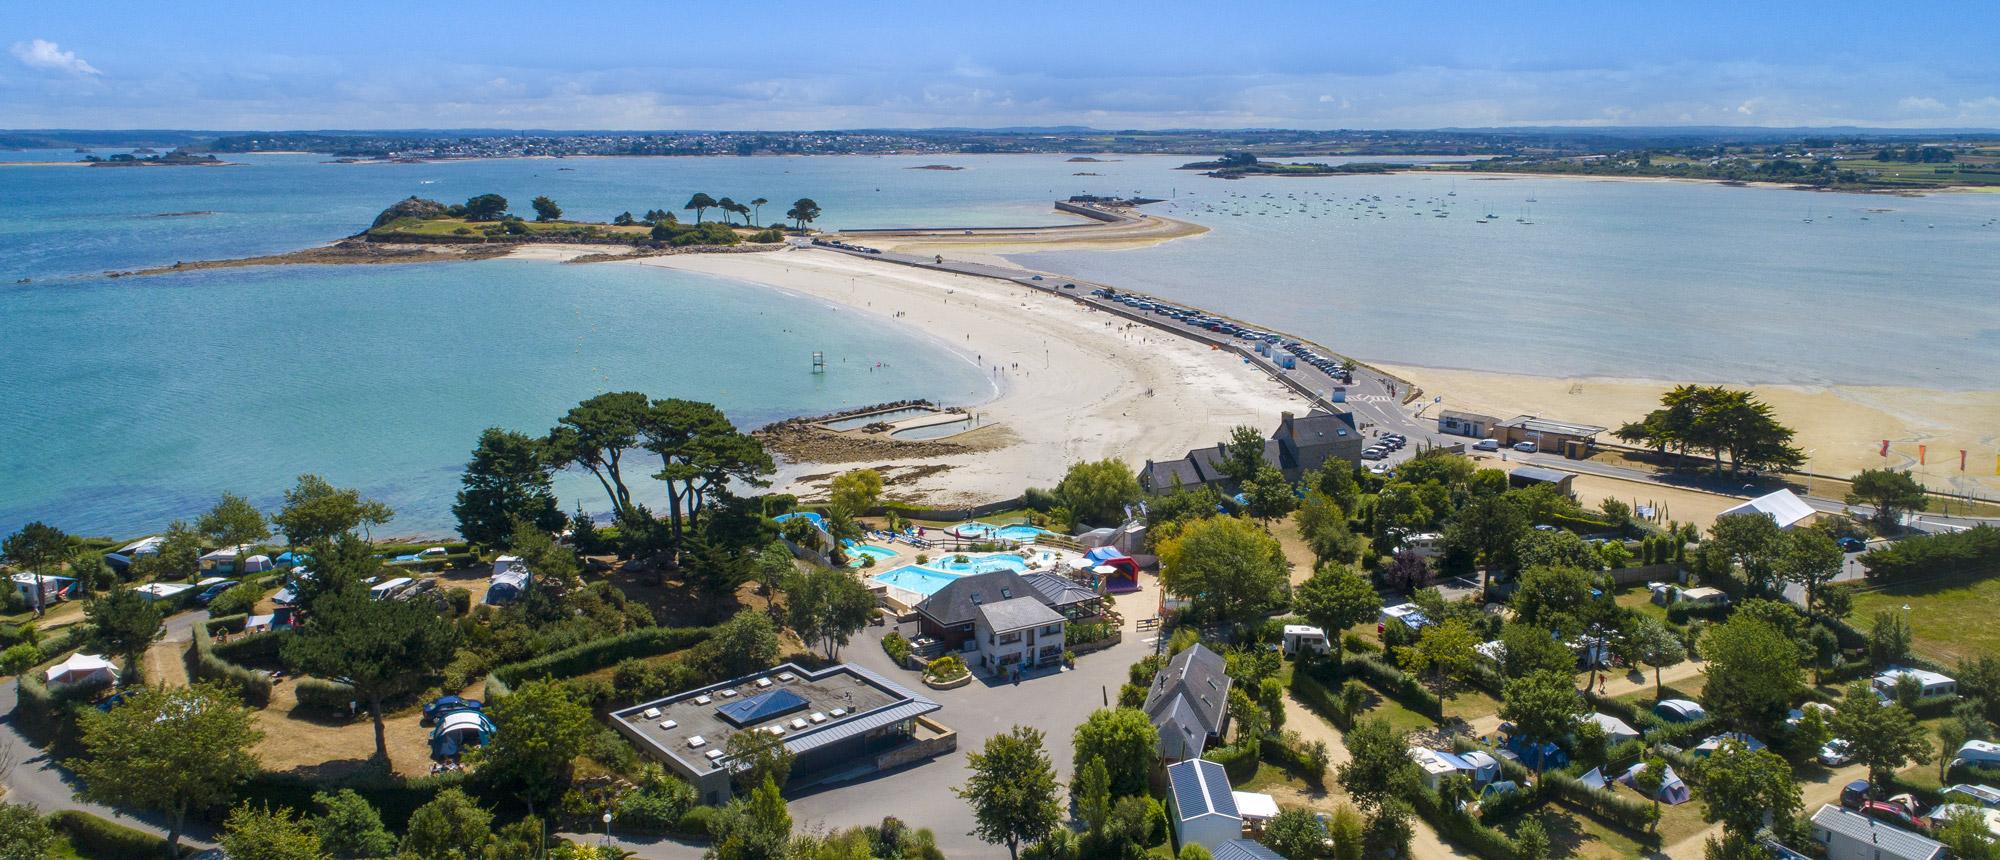 Camping Ar Kleguer Finistère nord